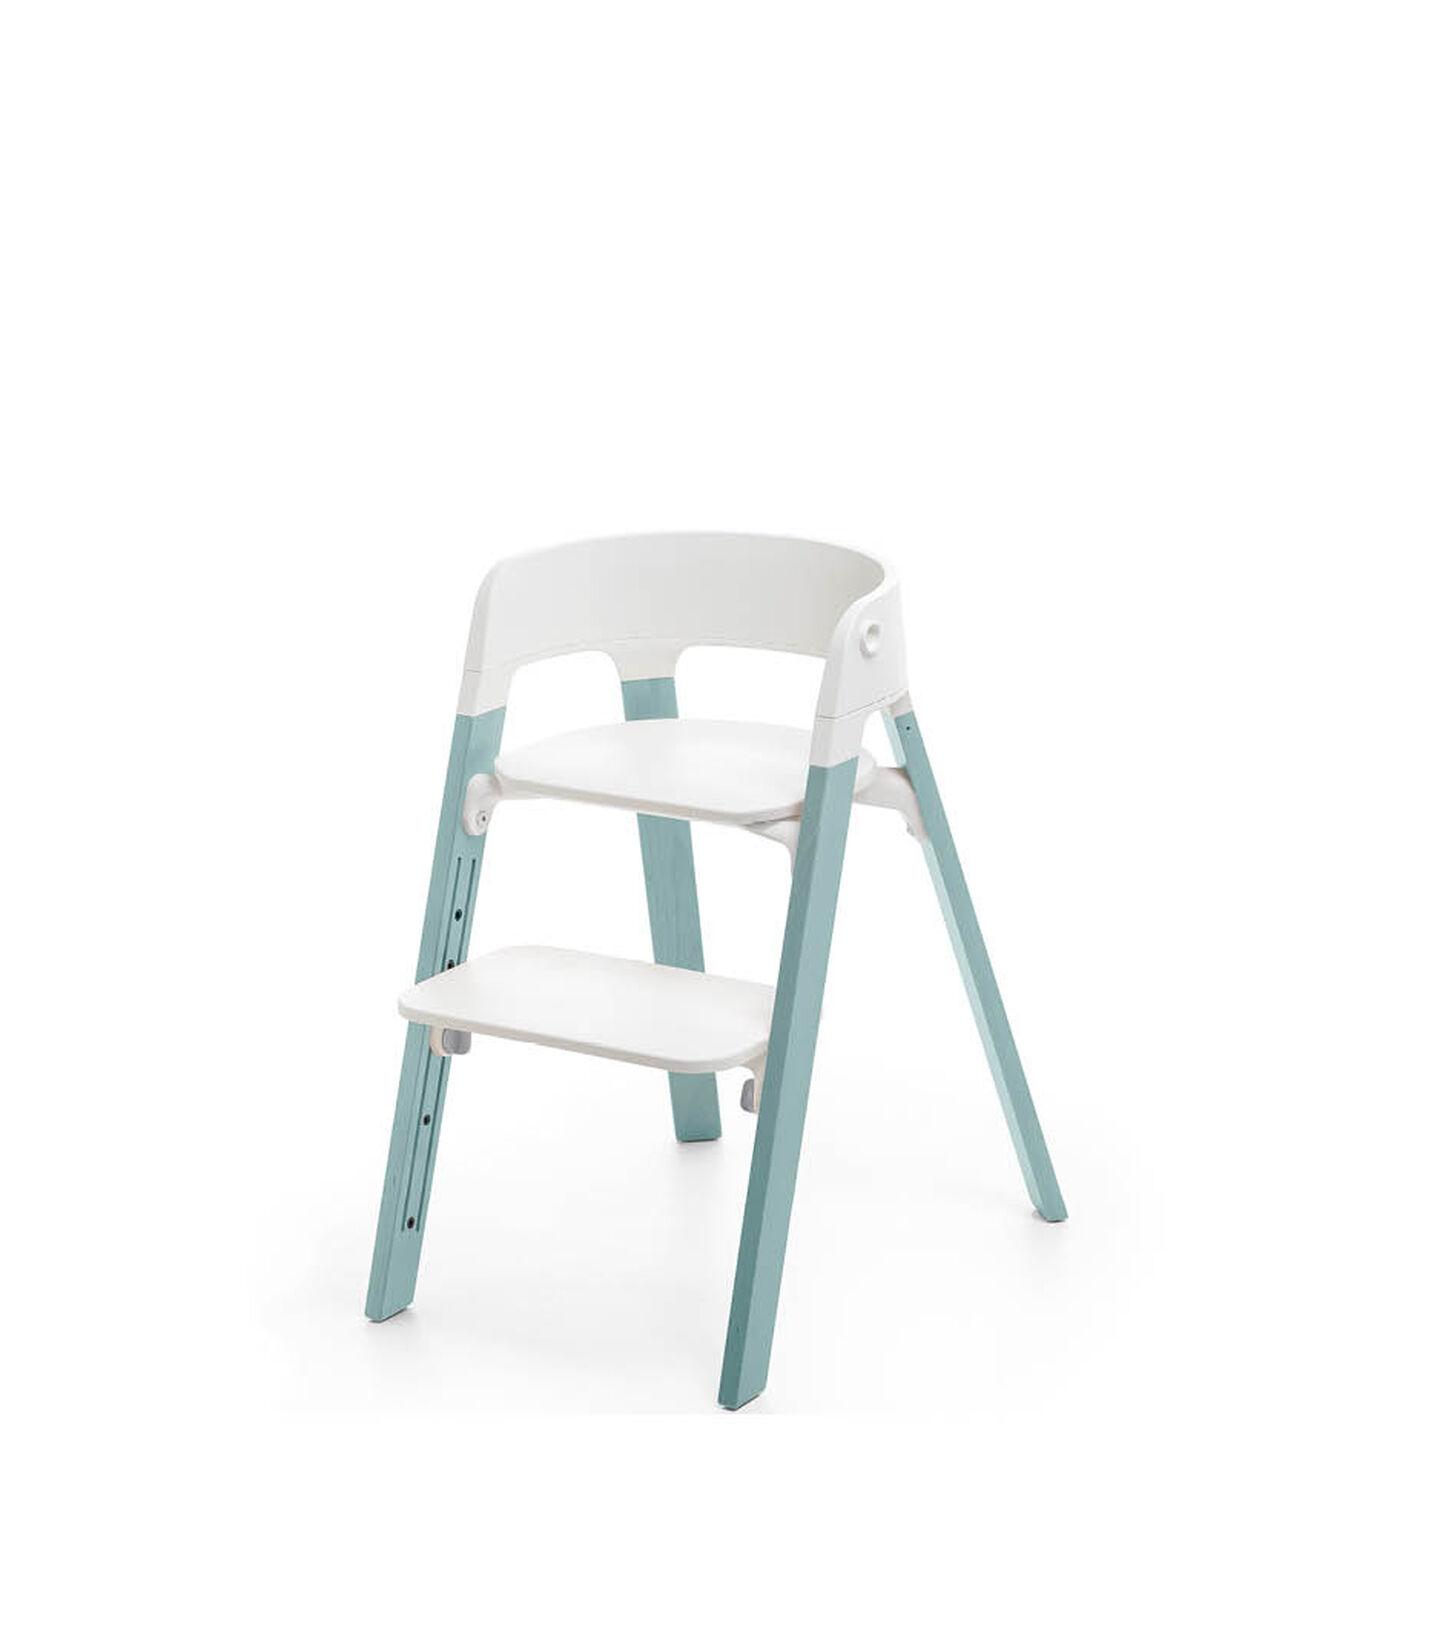 Stokke® Steps™ Chair White Seat Aqua Blue Legs, Aqua Blue, mainview view 1